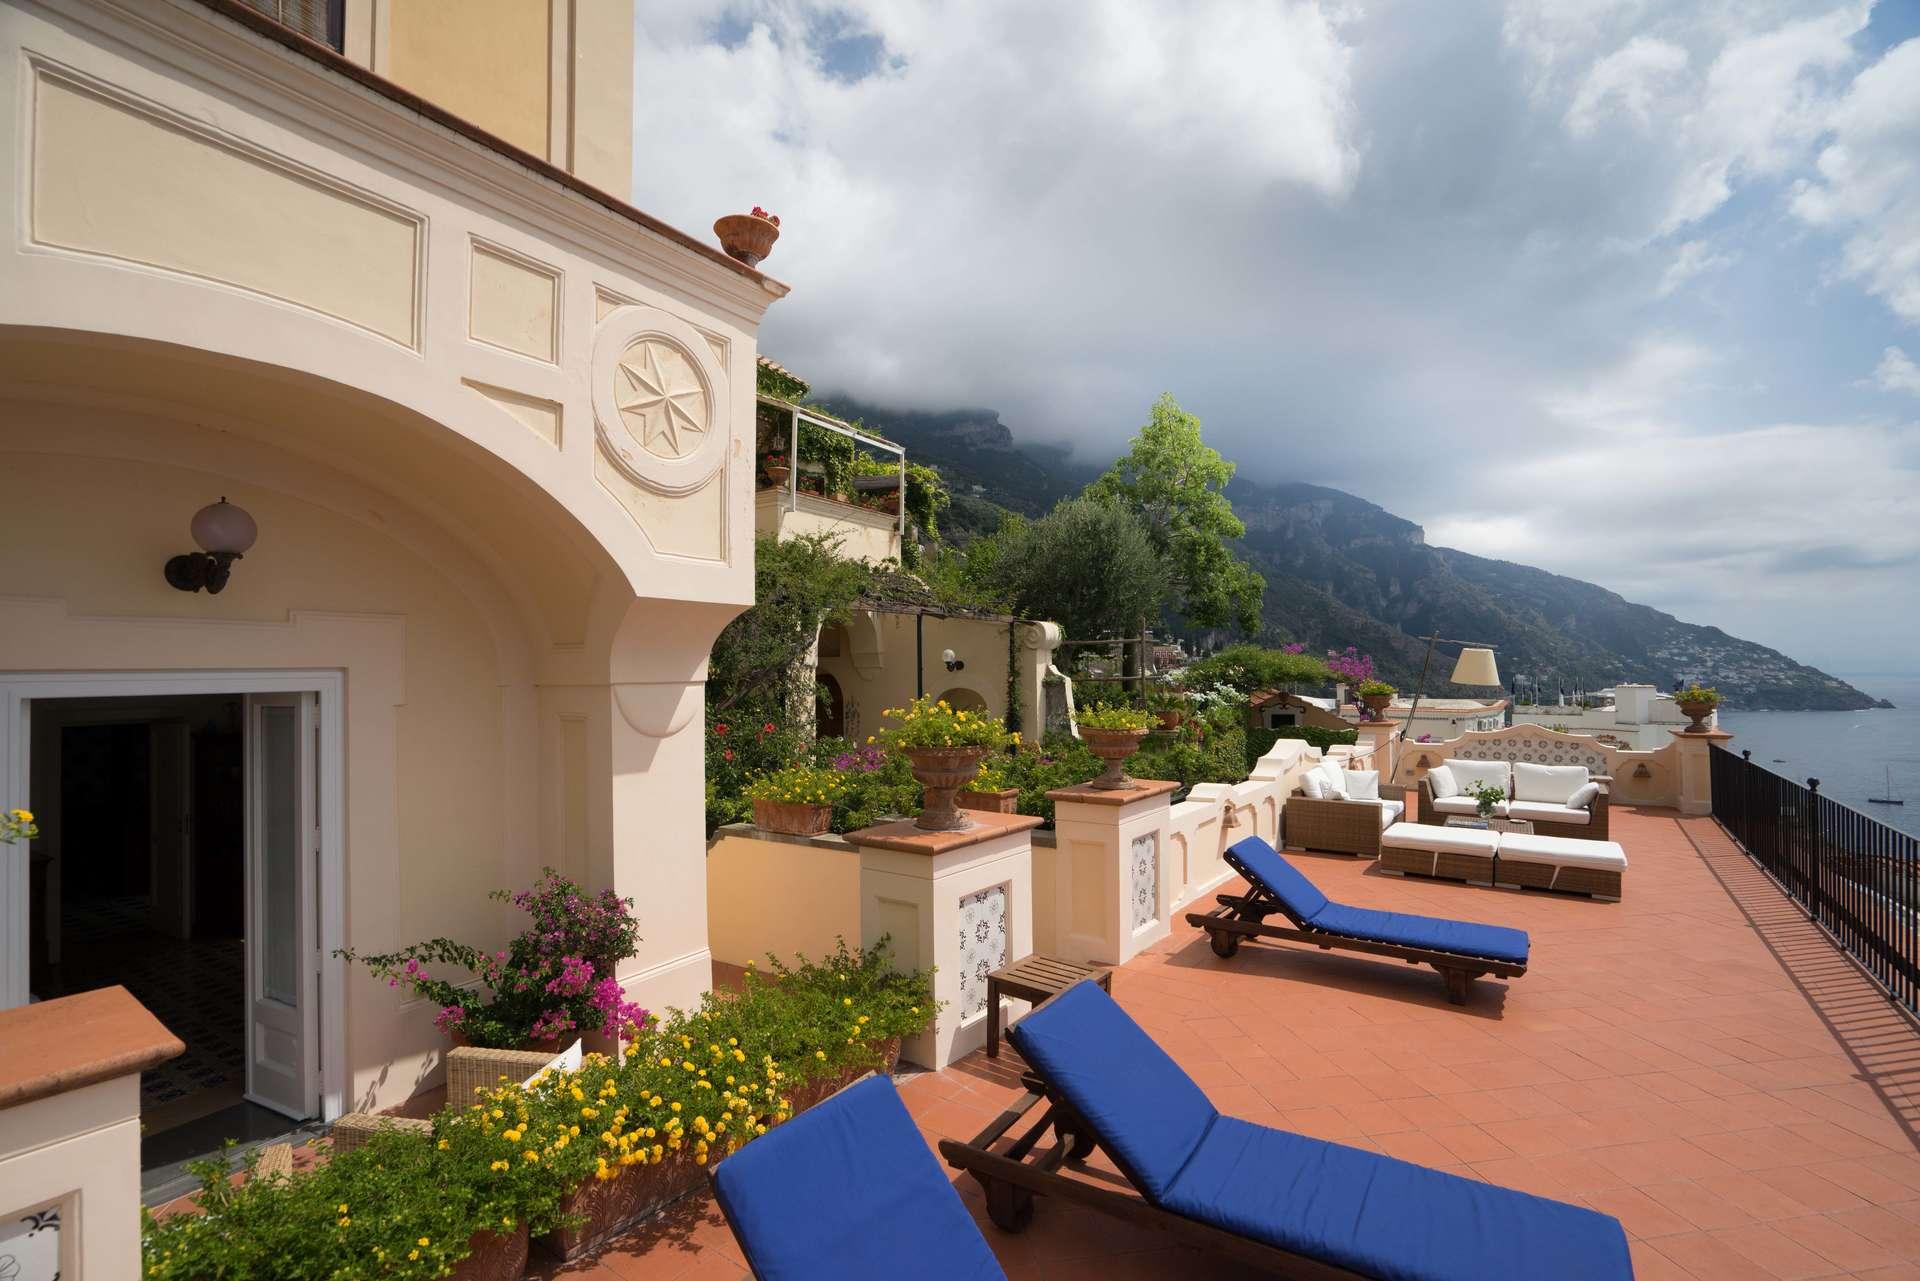 Luxury vacation rentals europe - Italy - Am alfico ast - Po sitano - Casa Ninfa - Image 1/27